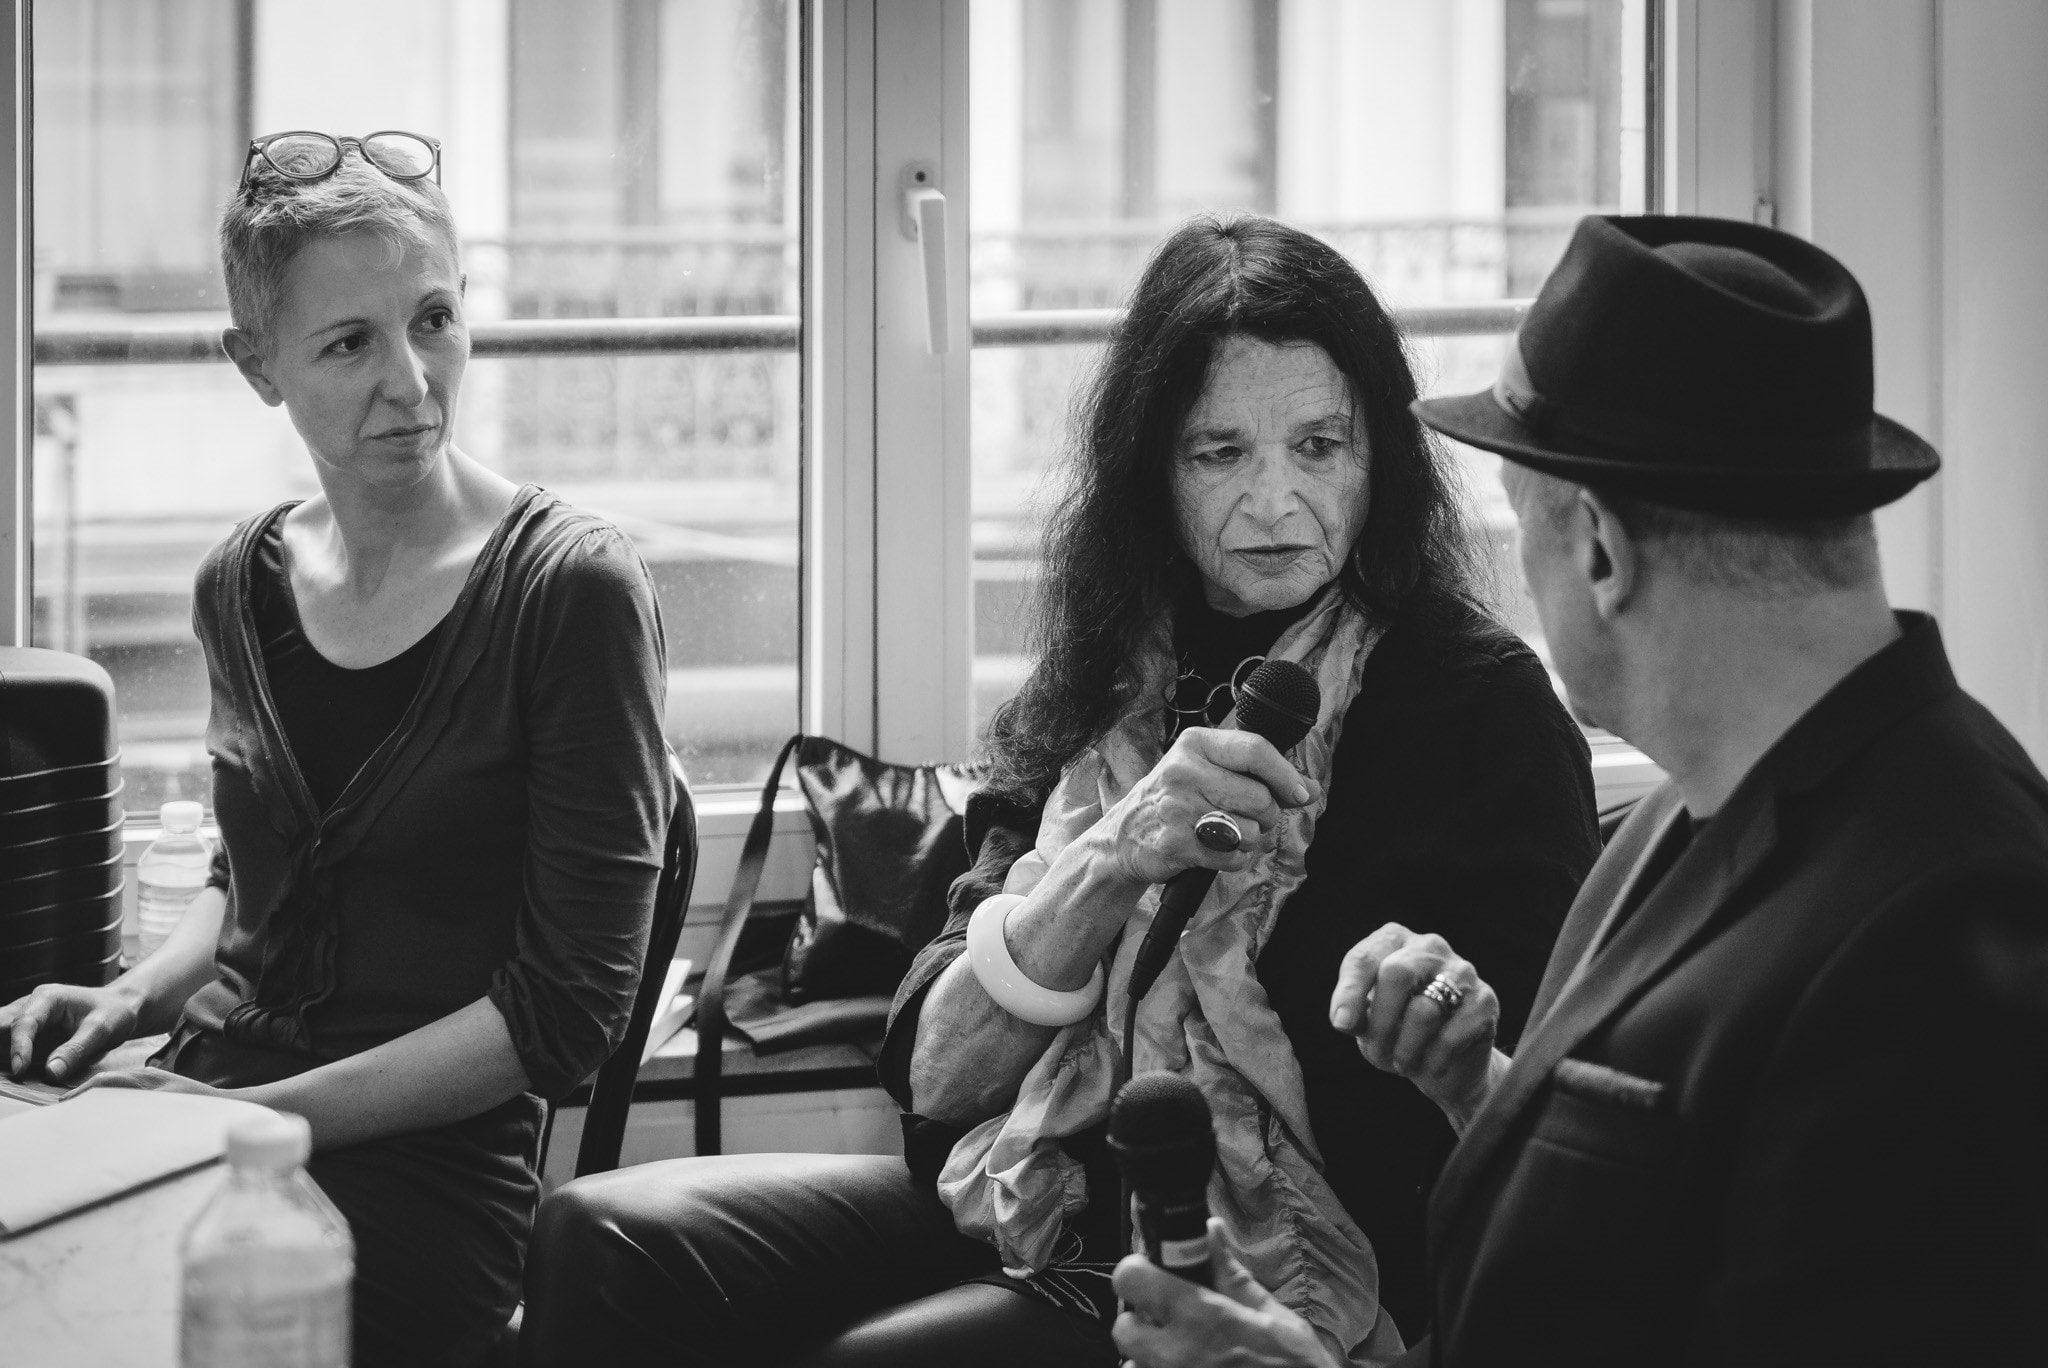 La Joie qui avance chancelante le long de la rue image GILLES FARCET et Anne Waldman (c) John Sellekaers fiEstival maelstrÖm reEvolution 2017 01